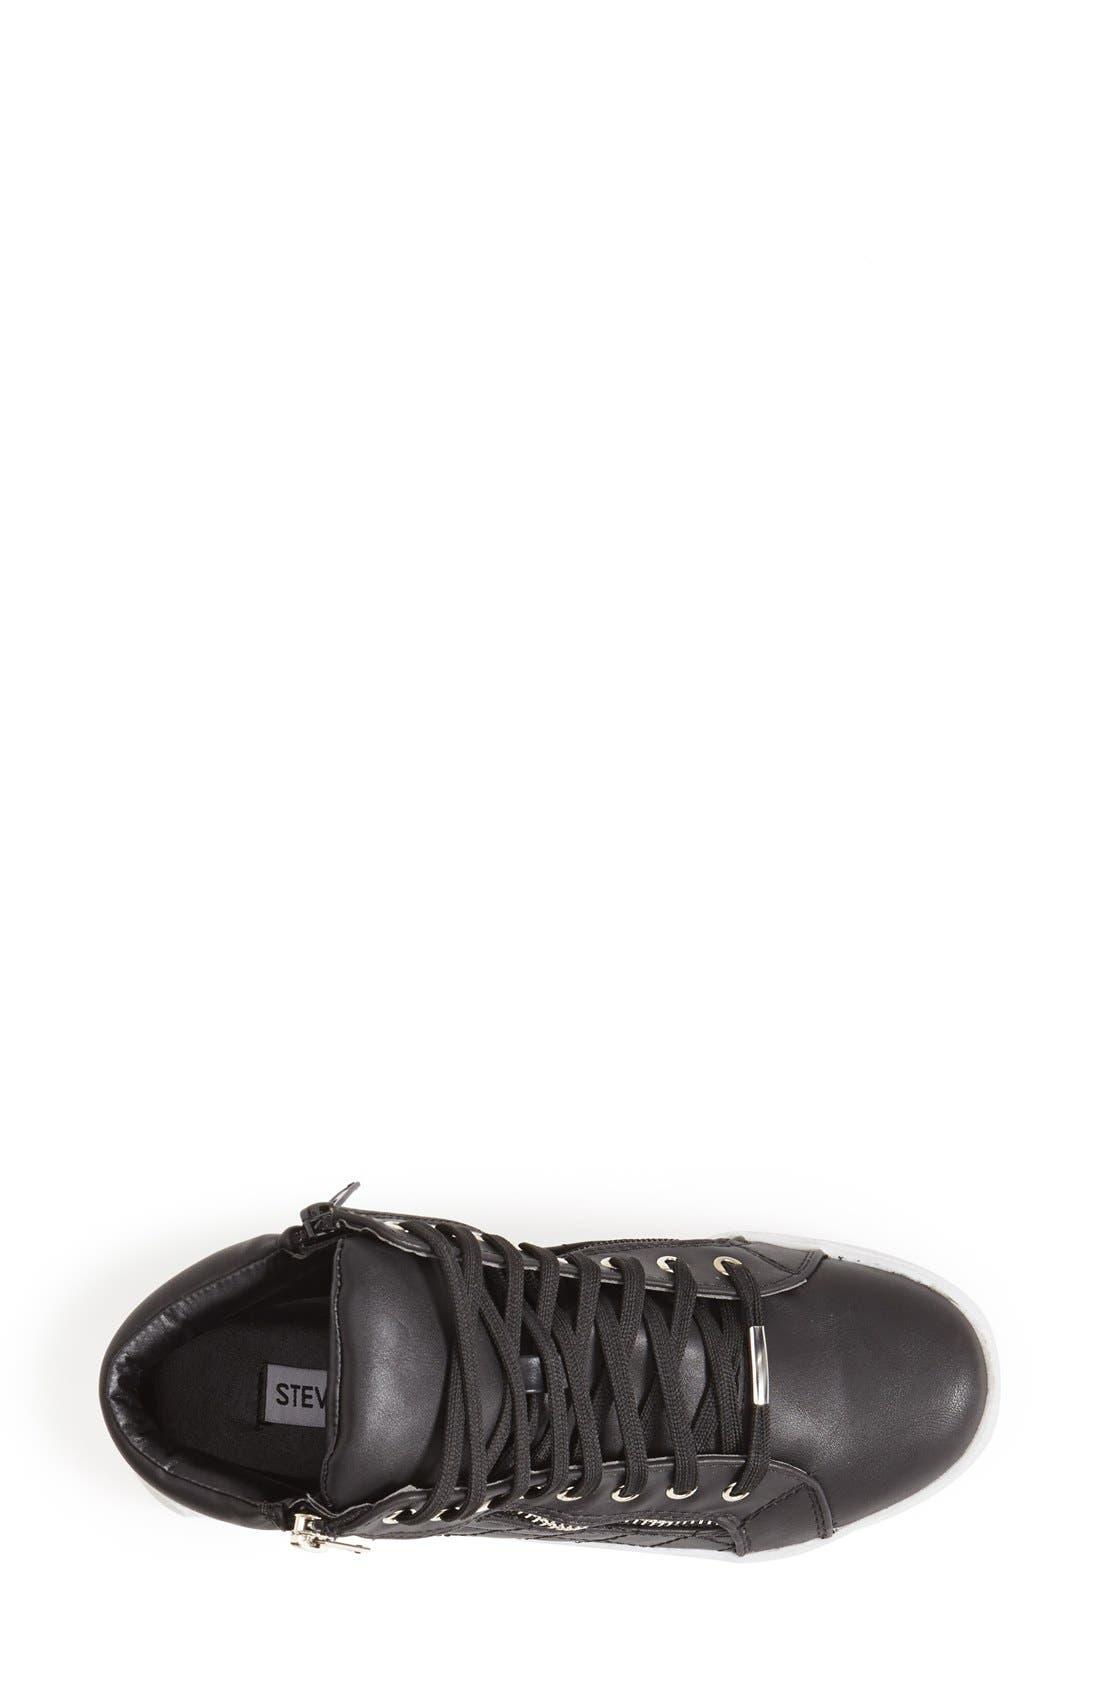 Alternate Image 3  - Steve Madden 'Decaf' Quilted High Top Sneaker (Women)